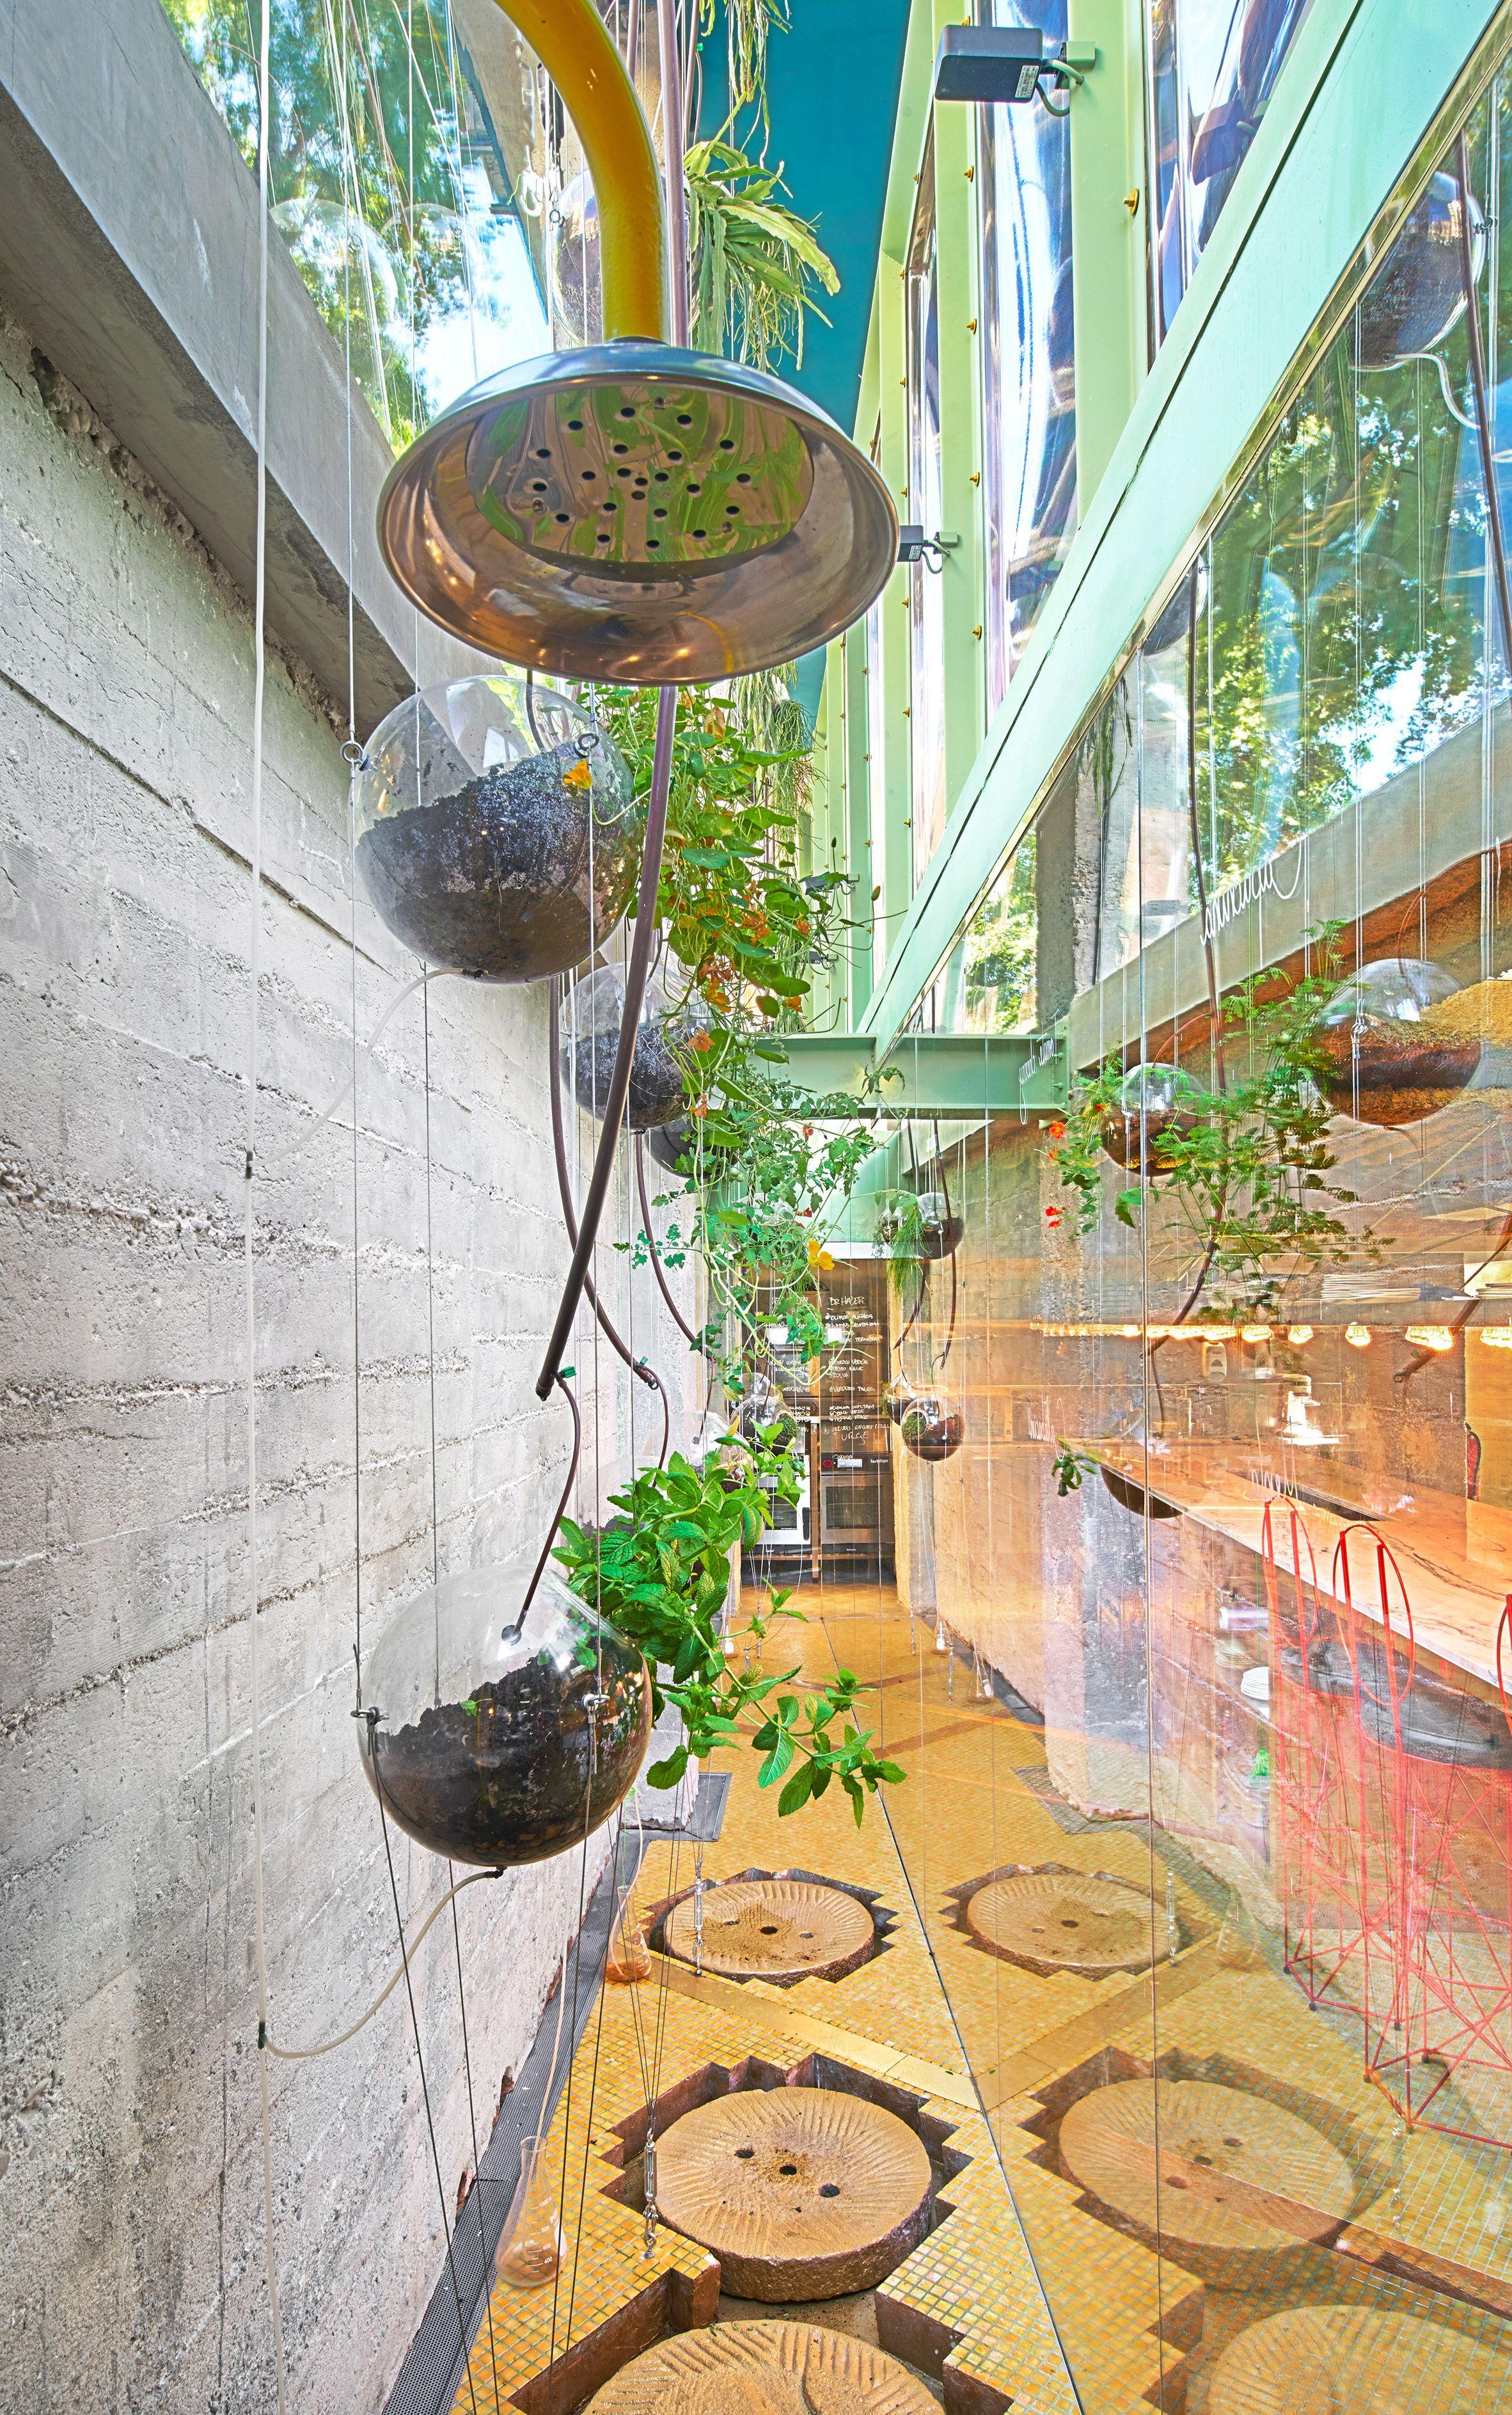 Run Run Run Cafe Has A Hanging Garden And See Through Showers Architectural Elements Comercial Interior Design Hanging Garden